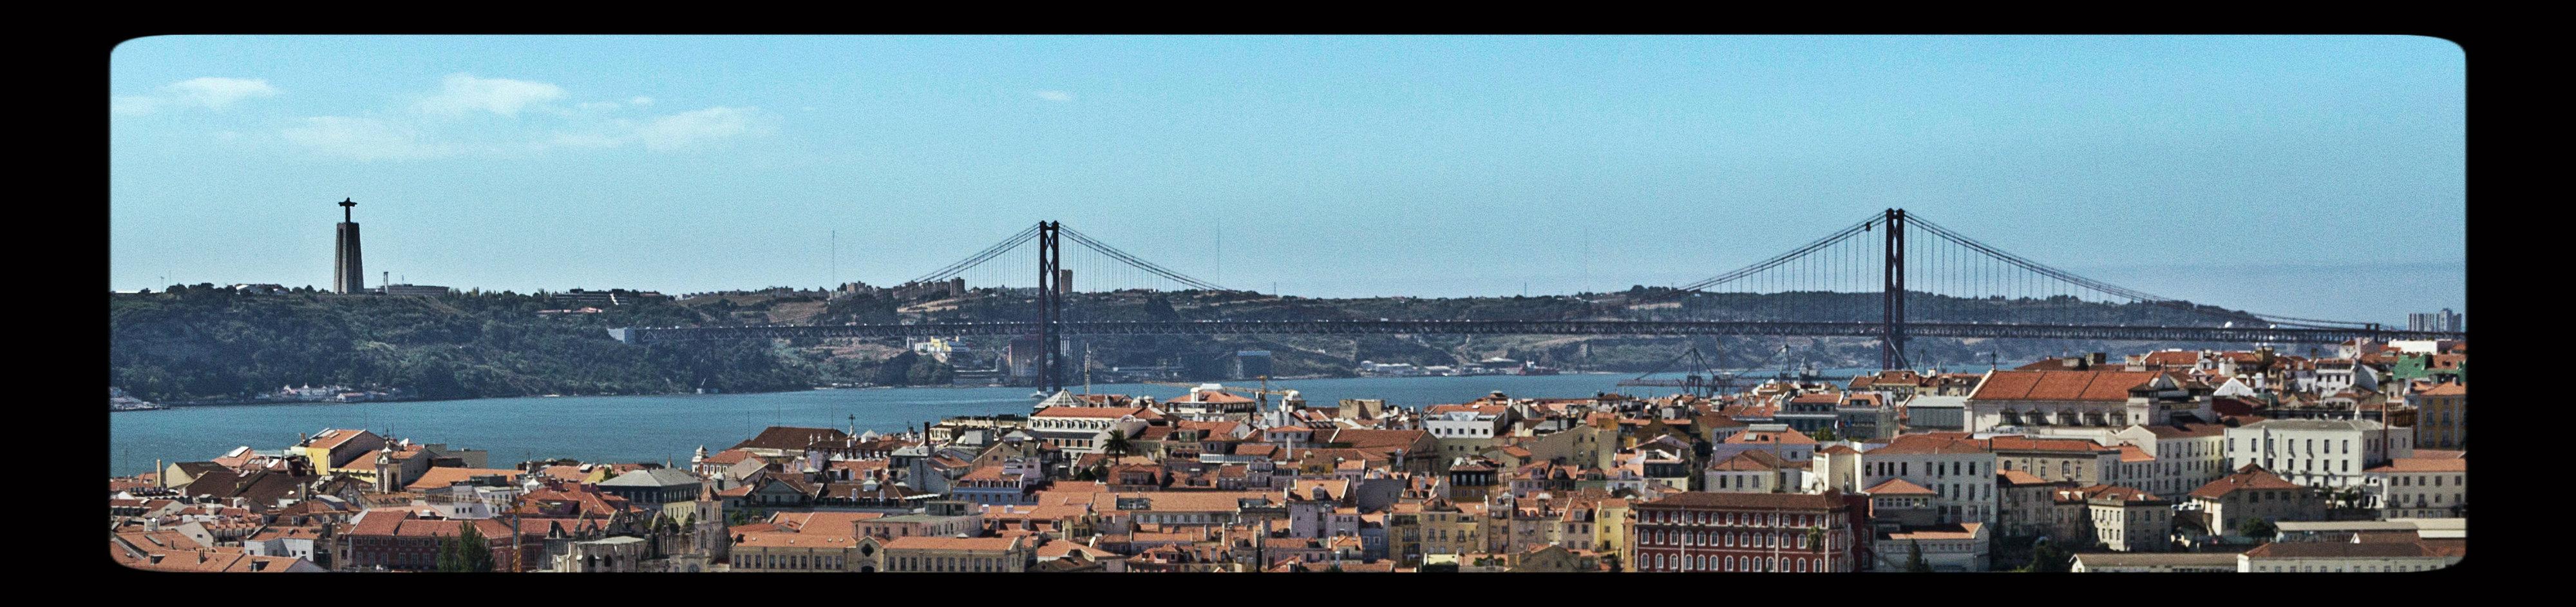 Vista de Lisboa - Wikipédia